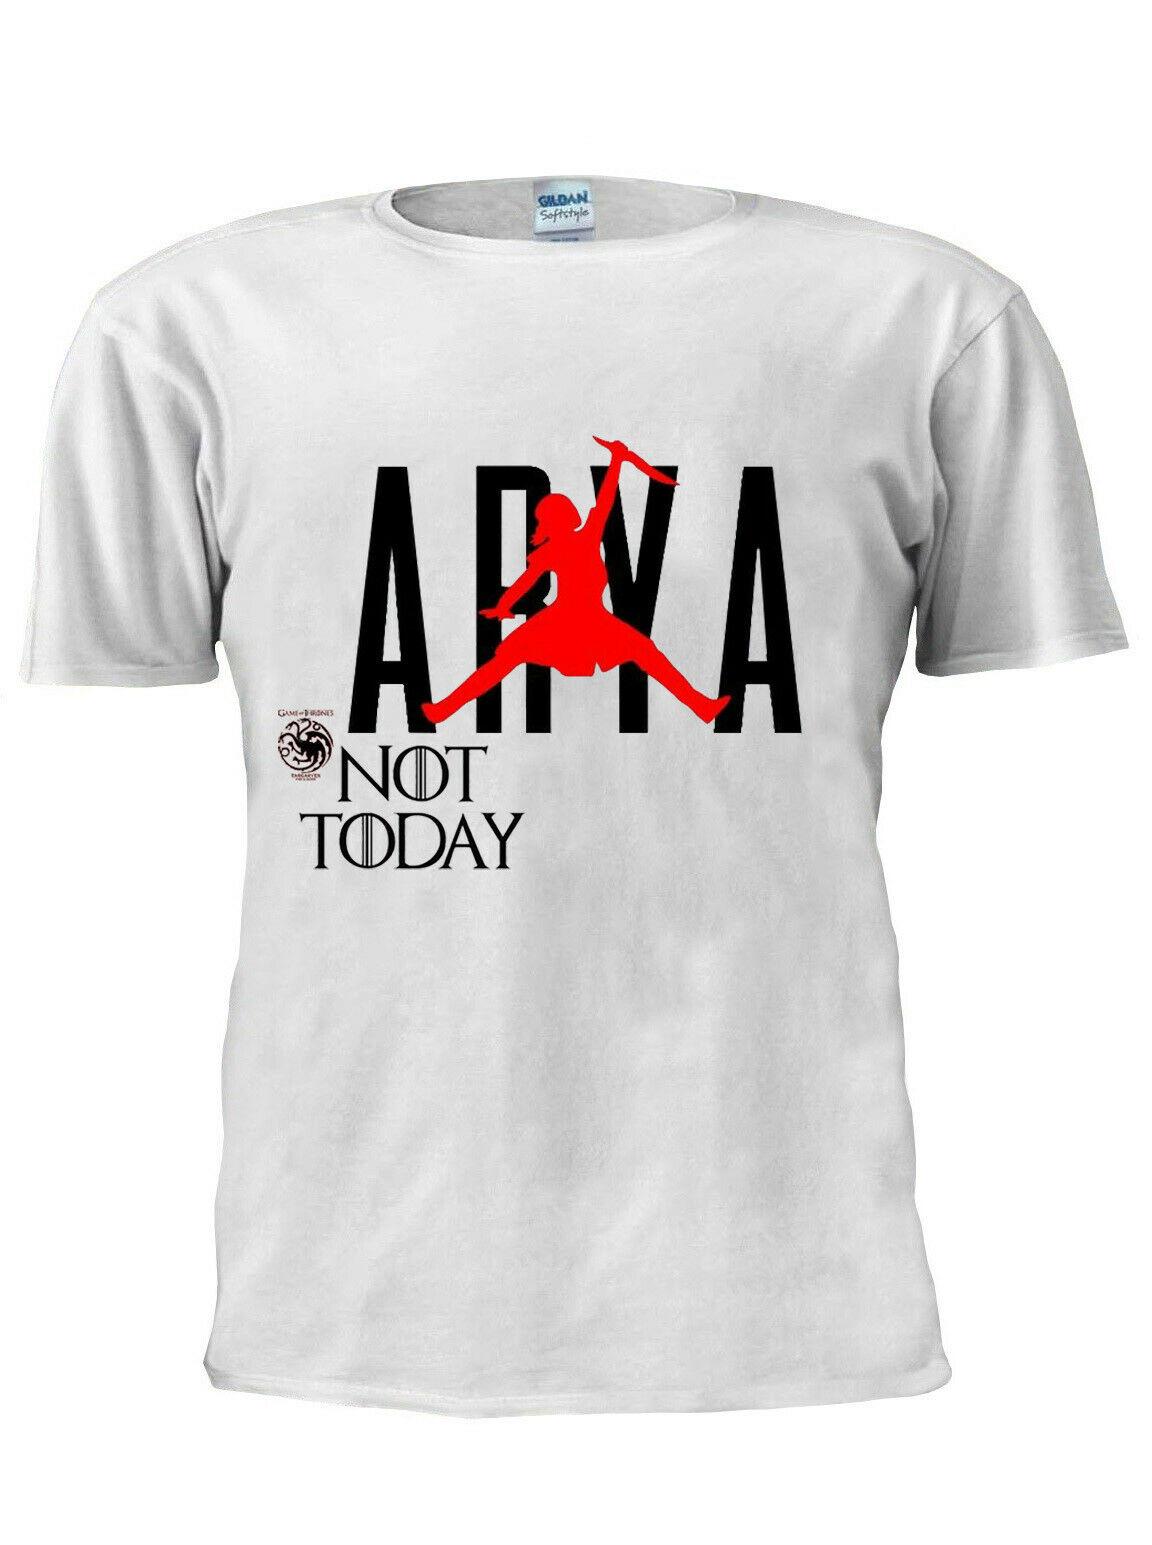 T-Shirt Game OF Thrones Arya Stark pas aujourd'hui hommes femmes unisexe T-Shirt M216 100% coton T-Shirt 2019 chaud t-shirts hauts en gros T-Shirt